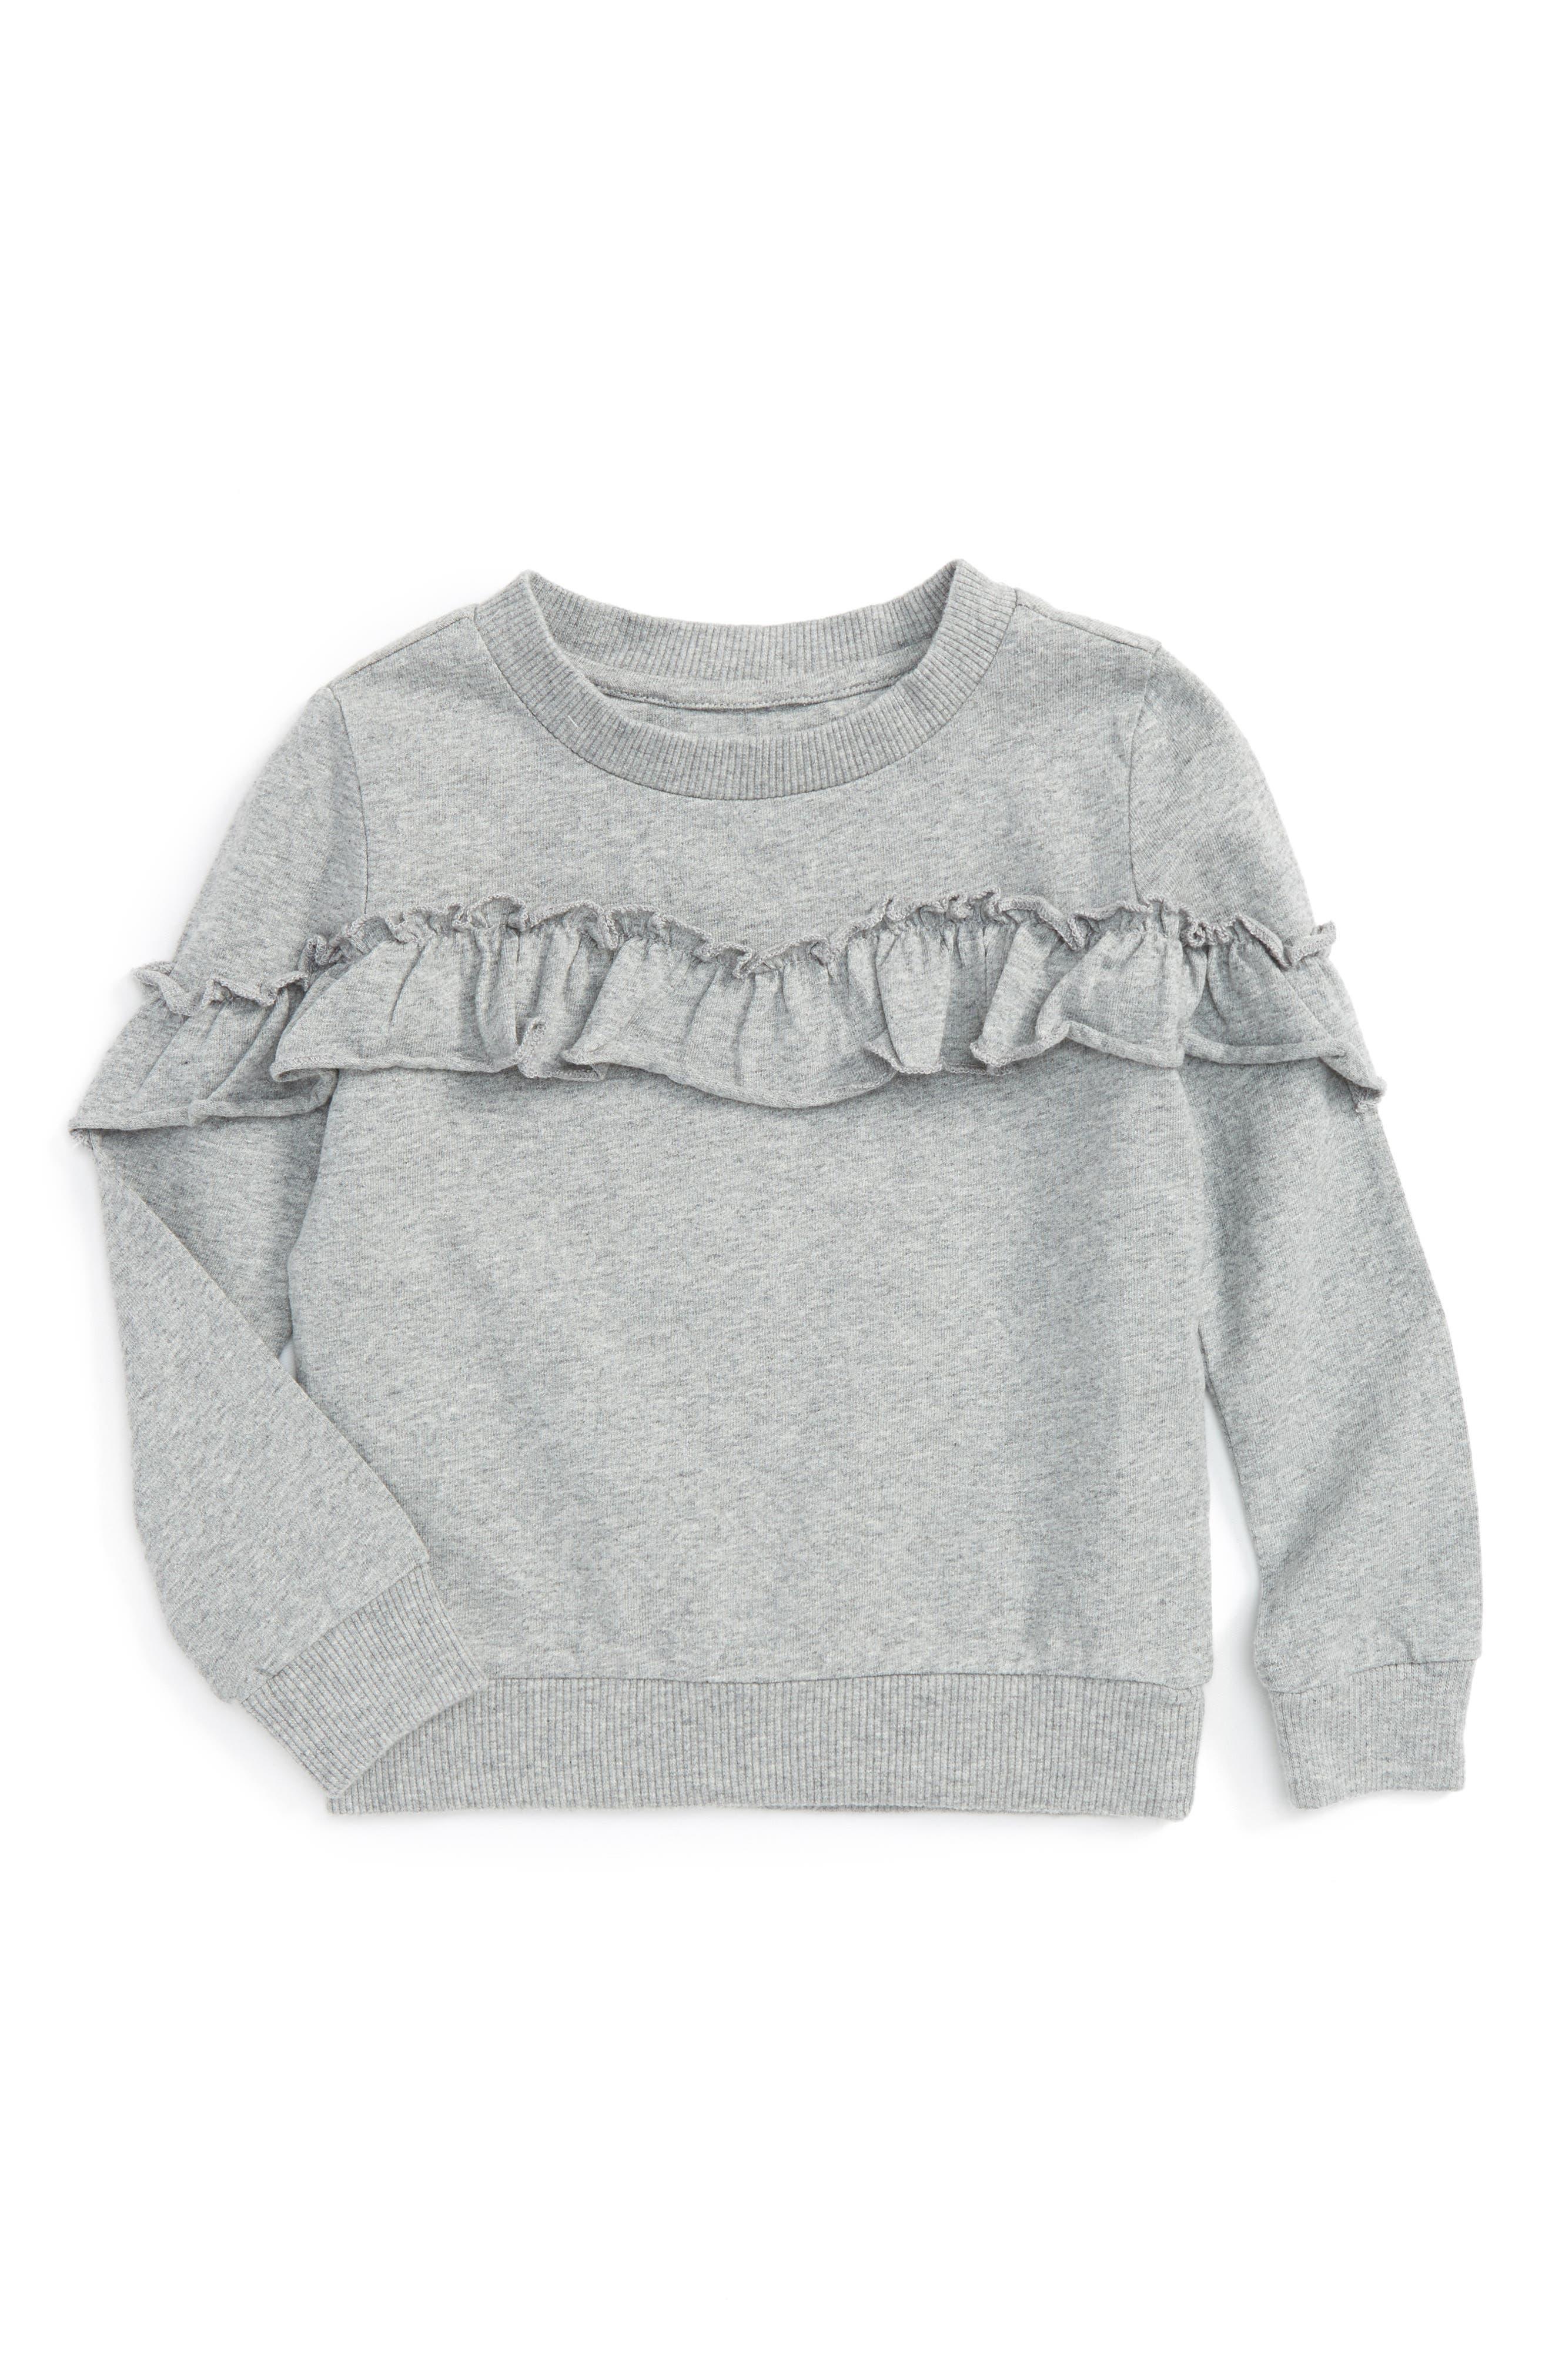 Ruffle Sweatshirt,                             Main thumbnail 1, color,